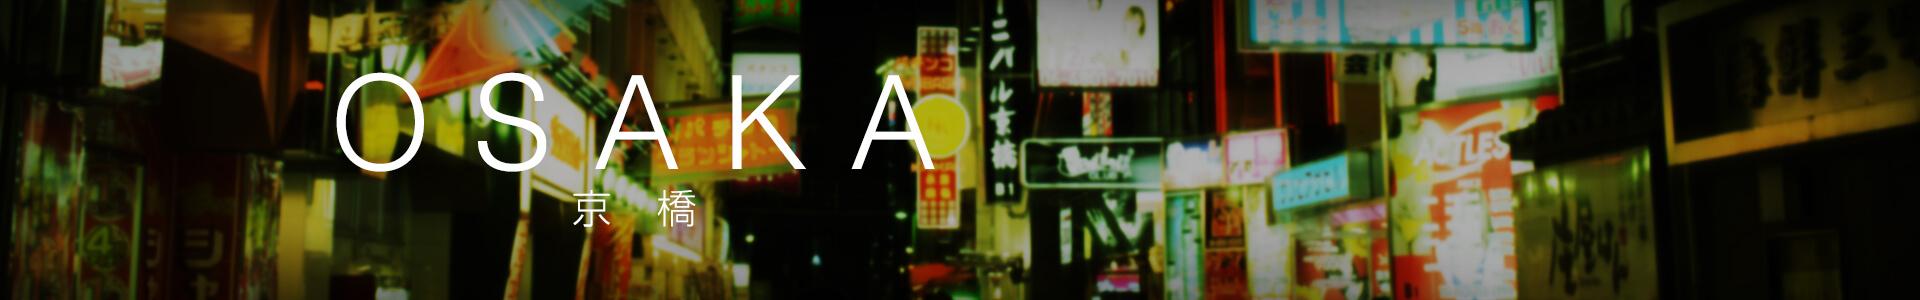 京橋・桜ノ宮